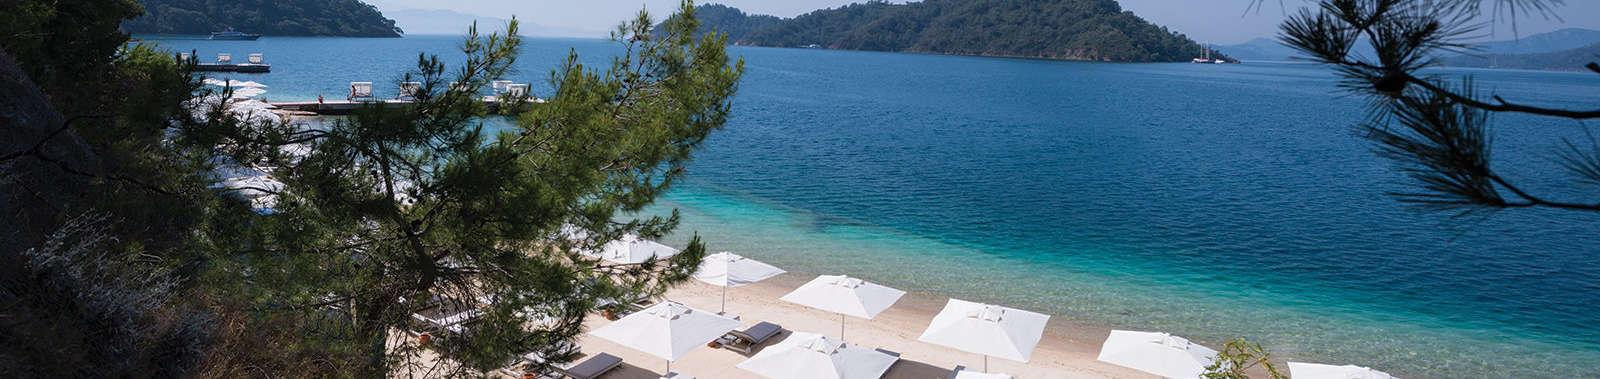 EU-Turkey-Fethiye-D-Resort-Gocek-1-e1464968719474